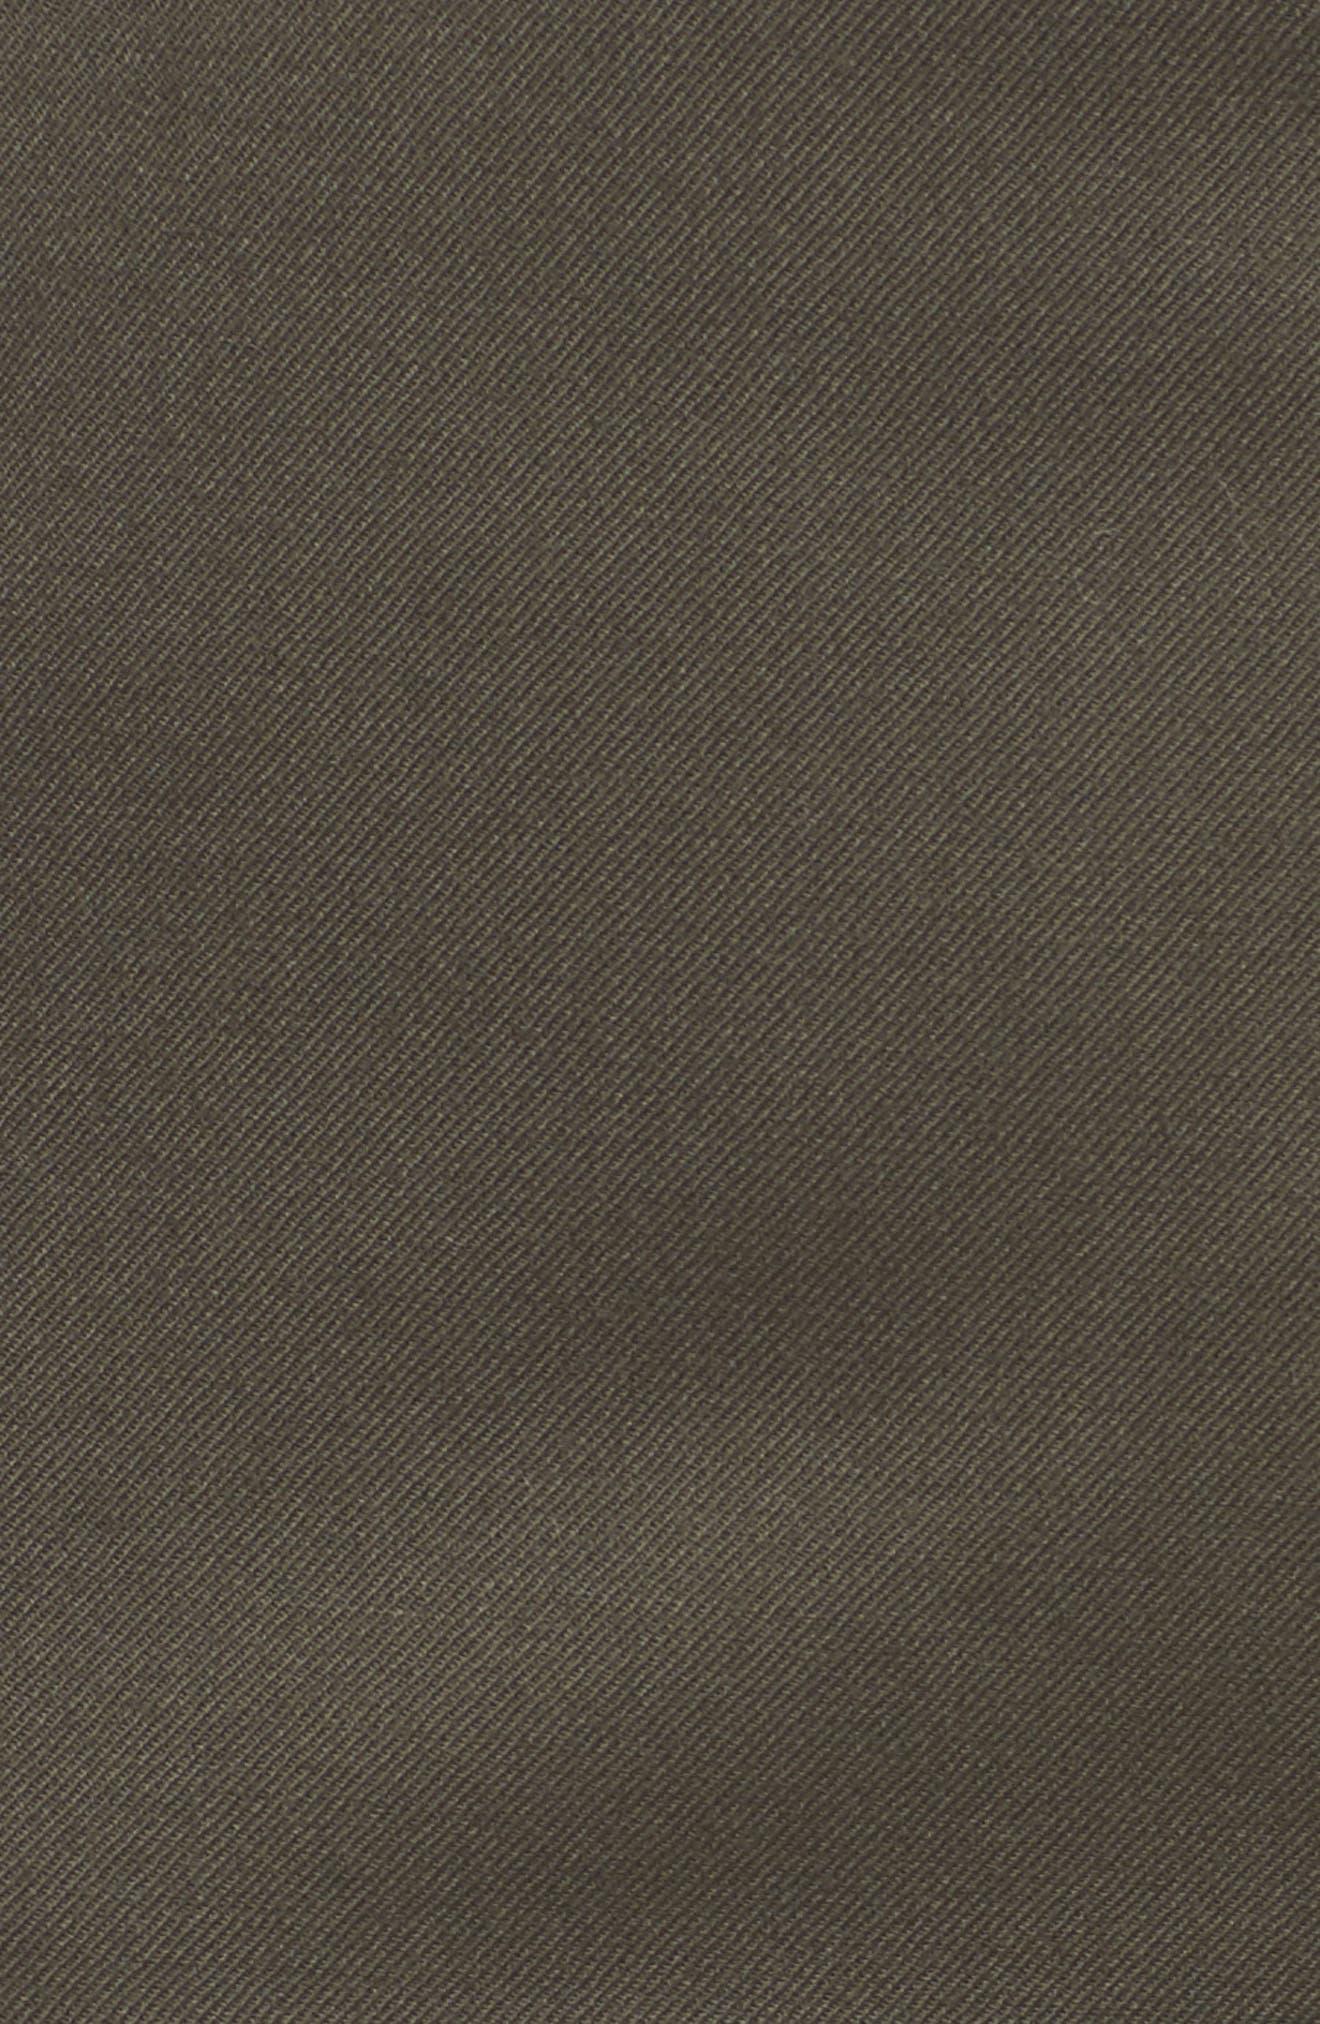 Alternate Image 5  - Lewit Wide Leg Stretch Wool Pants